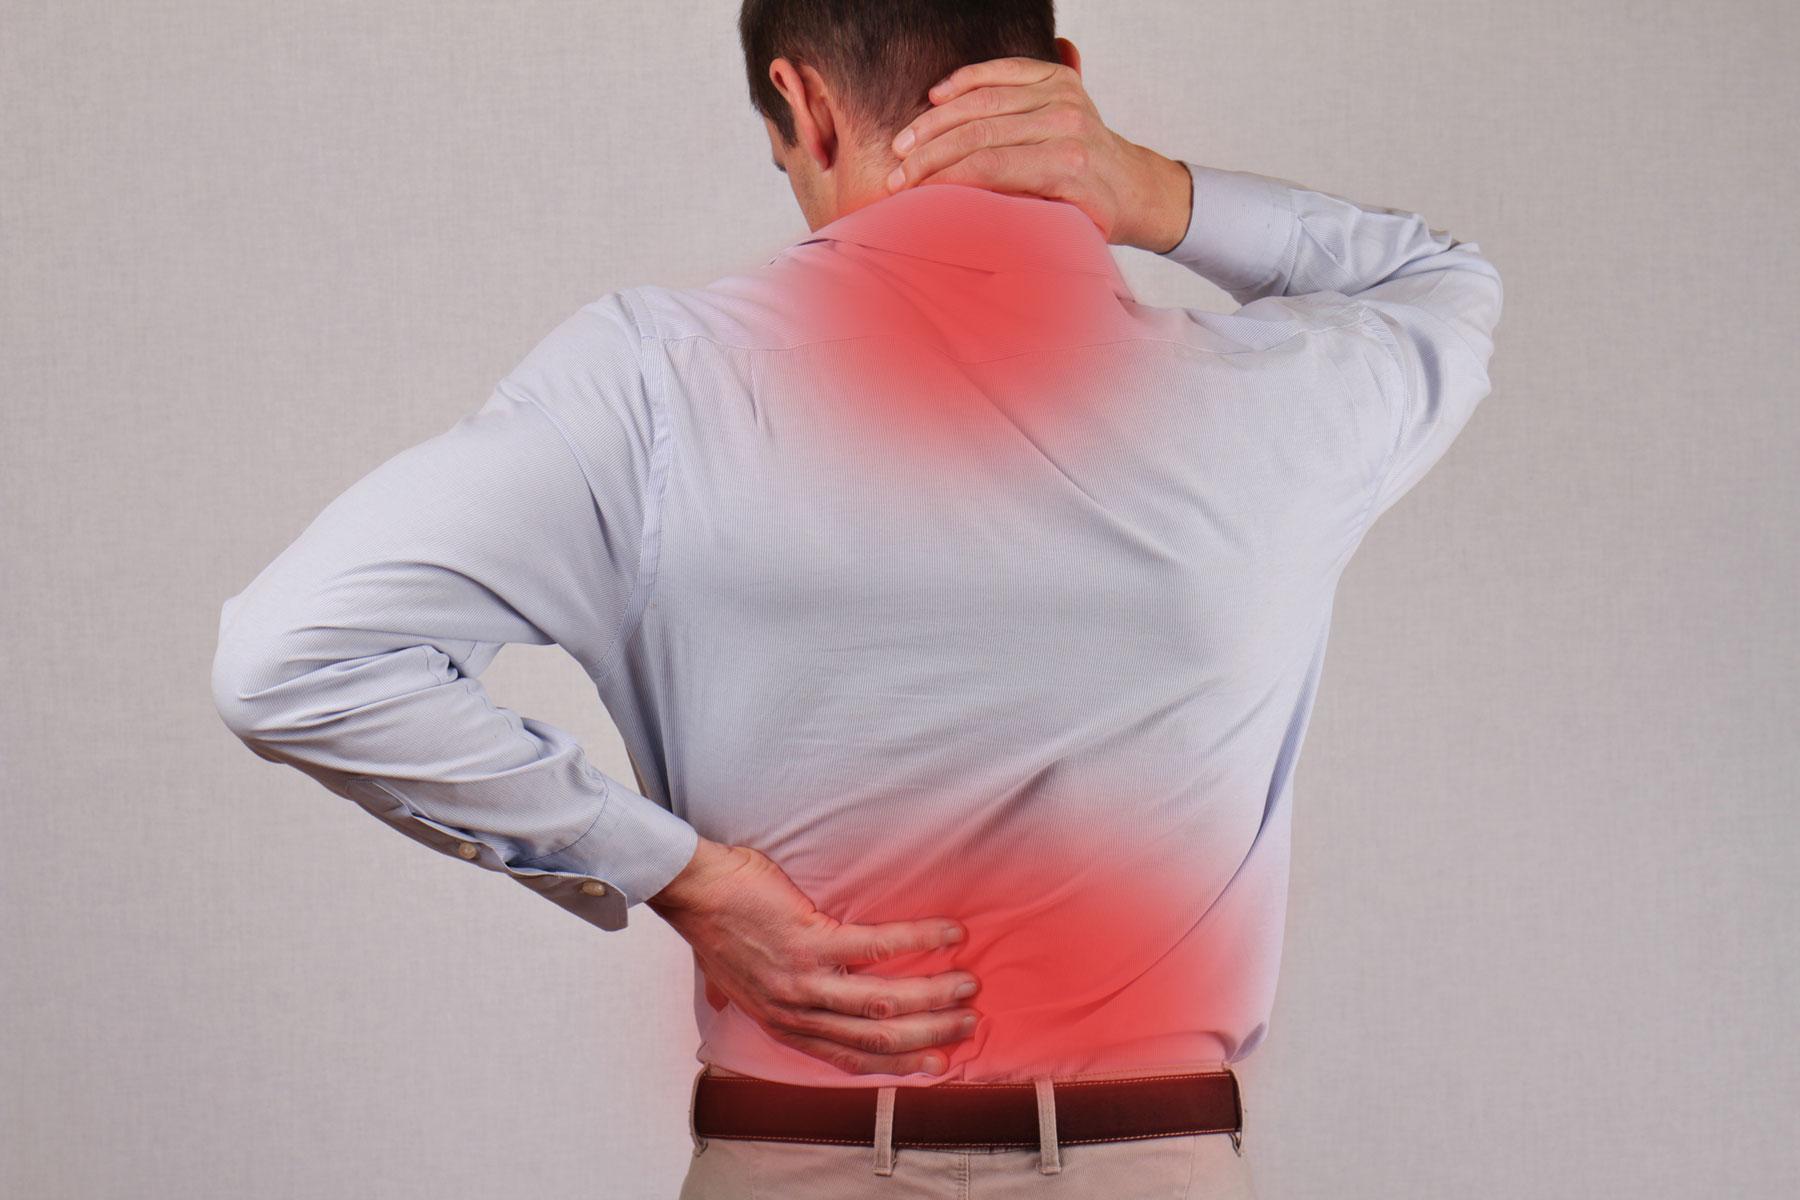 Facet Syndrome in Phoenix & Mesa - Whiplash